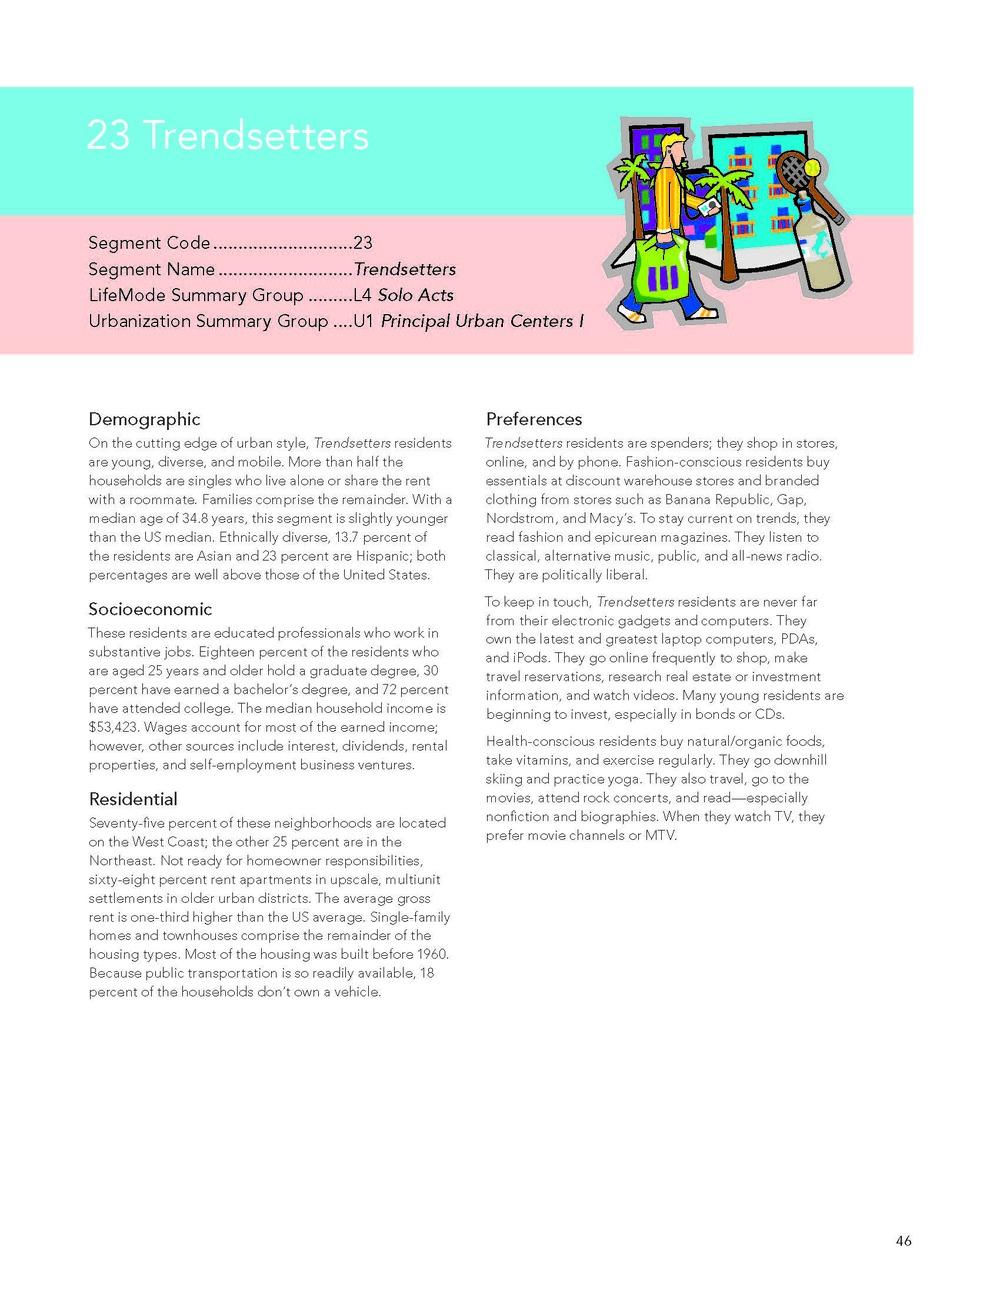 tapestry-segmentation_Page_49.jpg